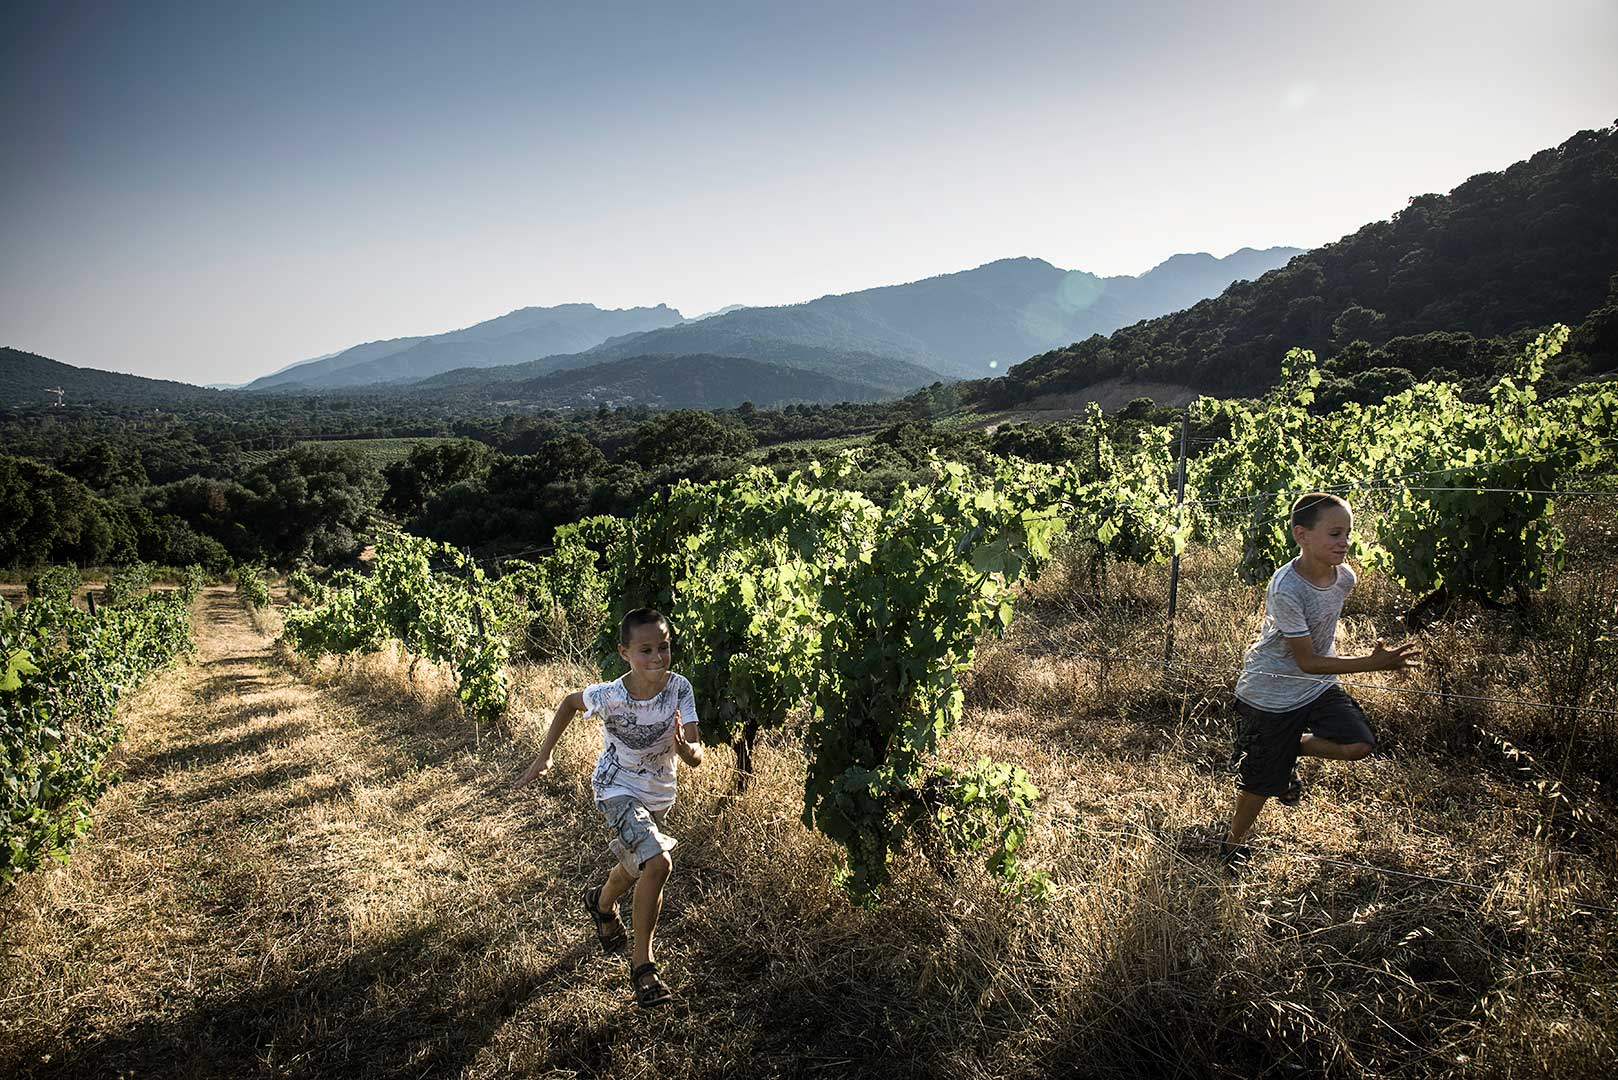 enfants qui courent dans les vignes, Corse, photo Emmanuel Perrin